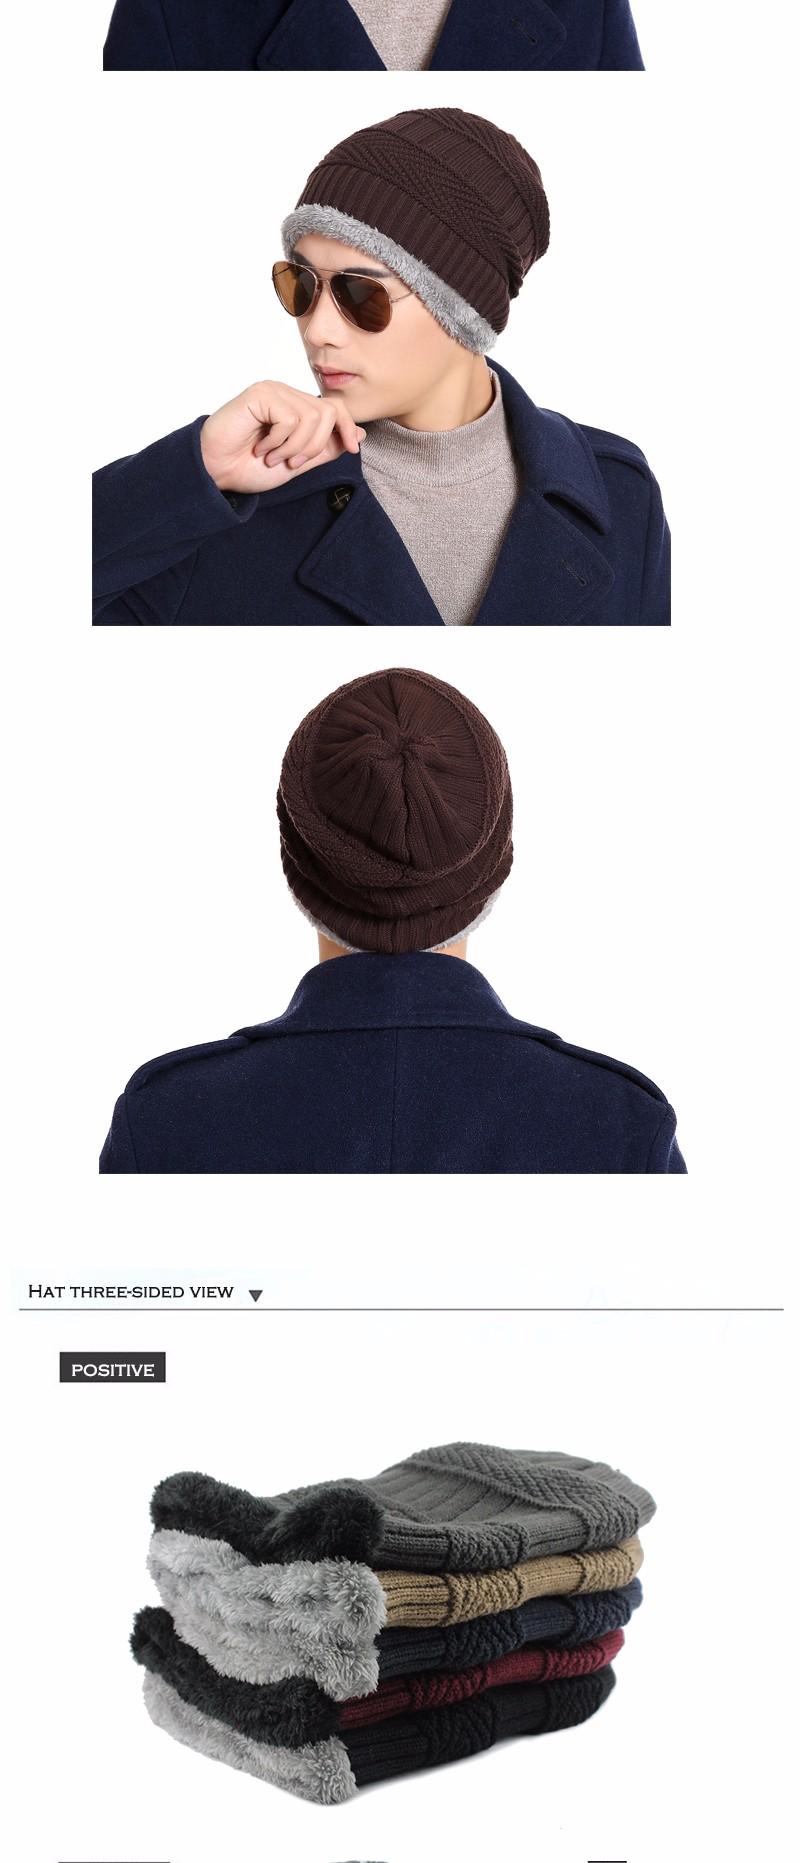 FETSBUY Pure Color Winter Skullies Beanies Hat Knit Winter Hat For Man Warm Hat Velvet Cap Bonnet Toucas Inverno Knitted Hats 19